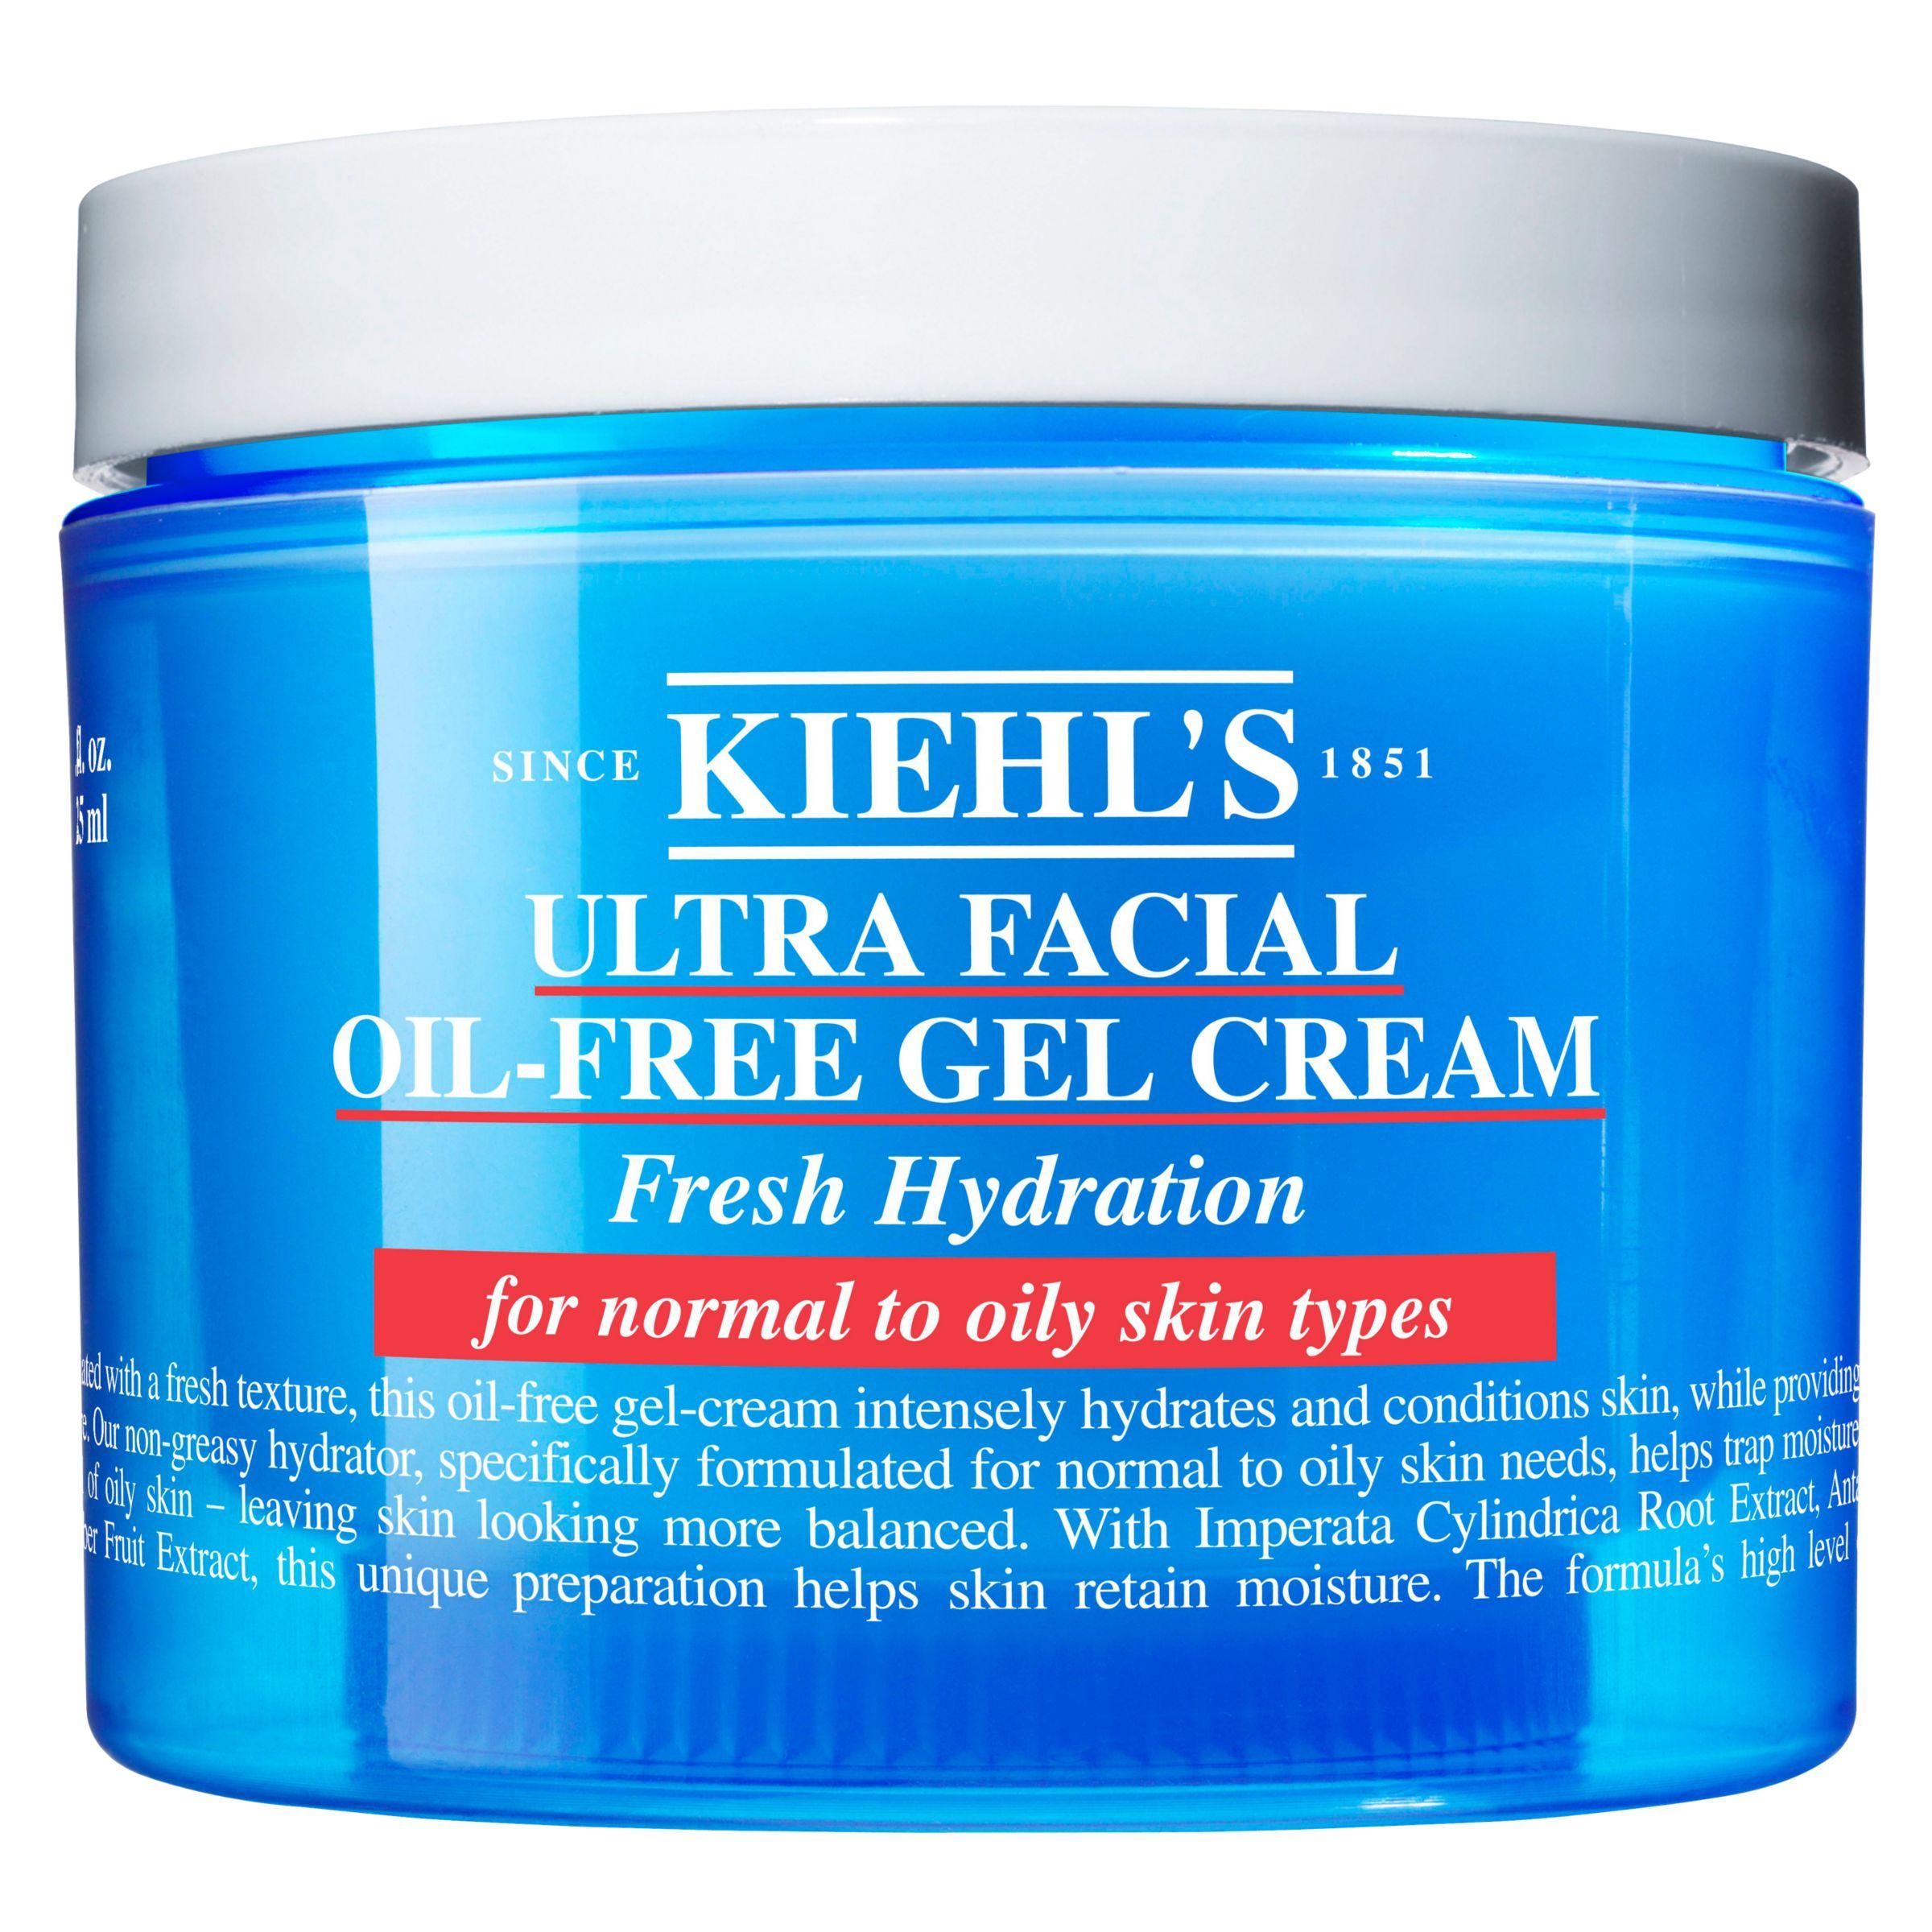 Kiehls Kiehl's Ultra Facial Oil-Free Gel Cream, 125ml